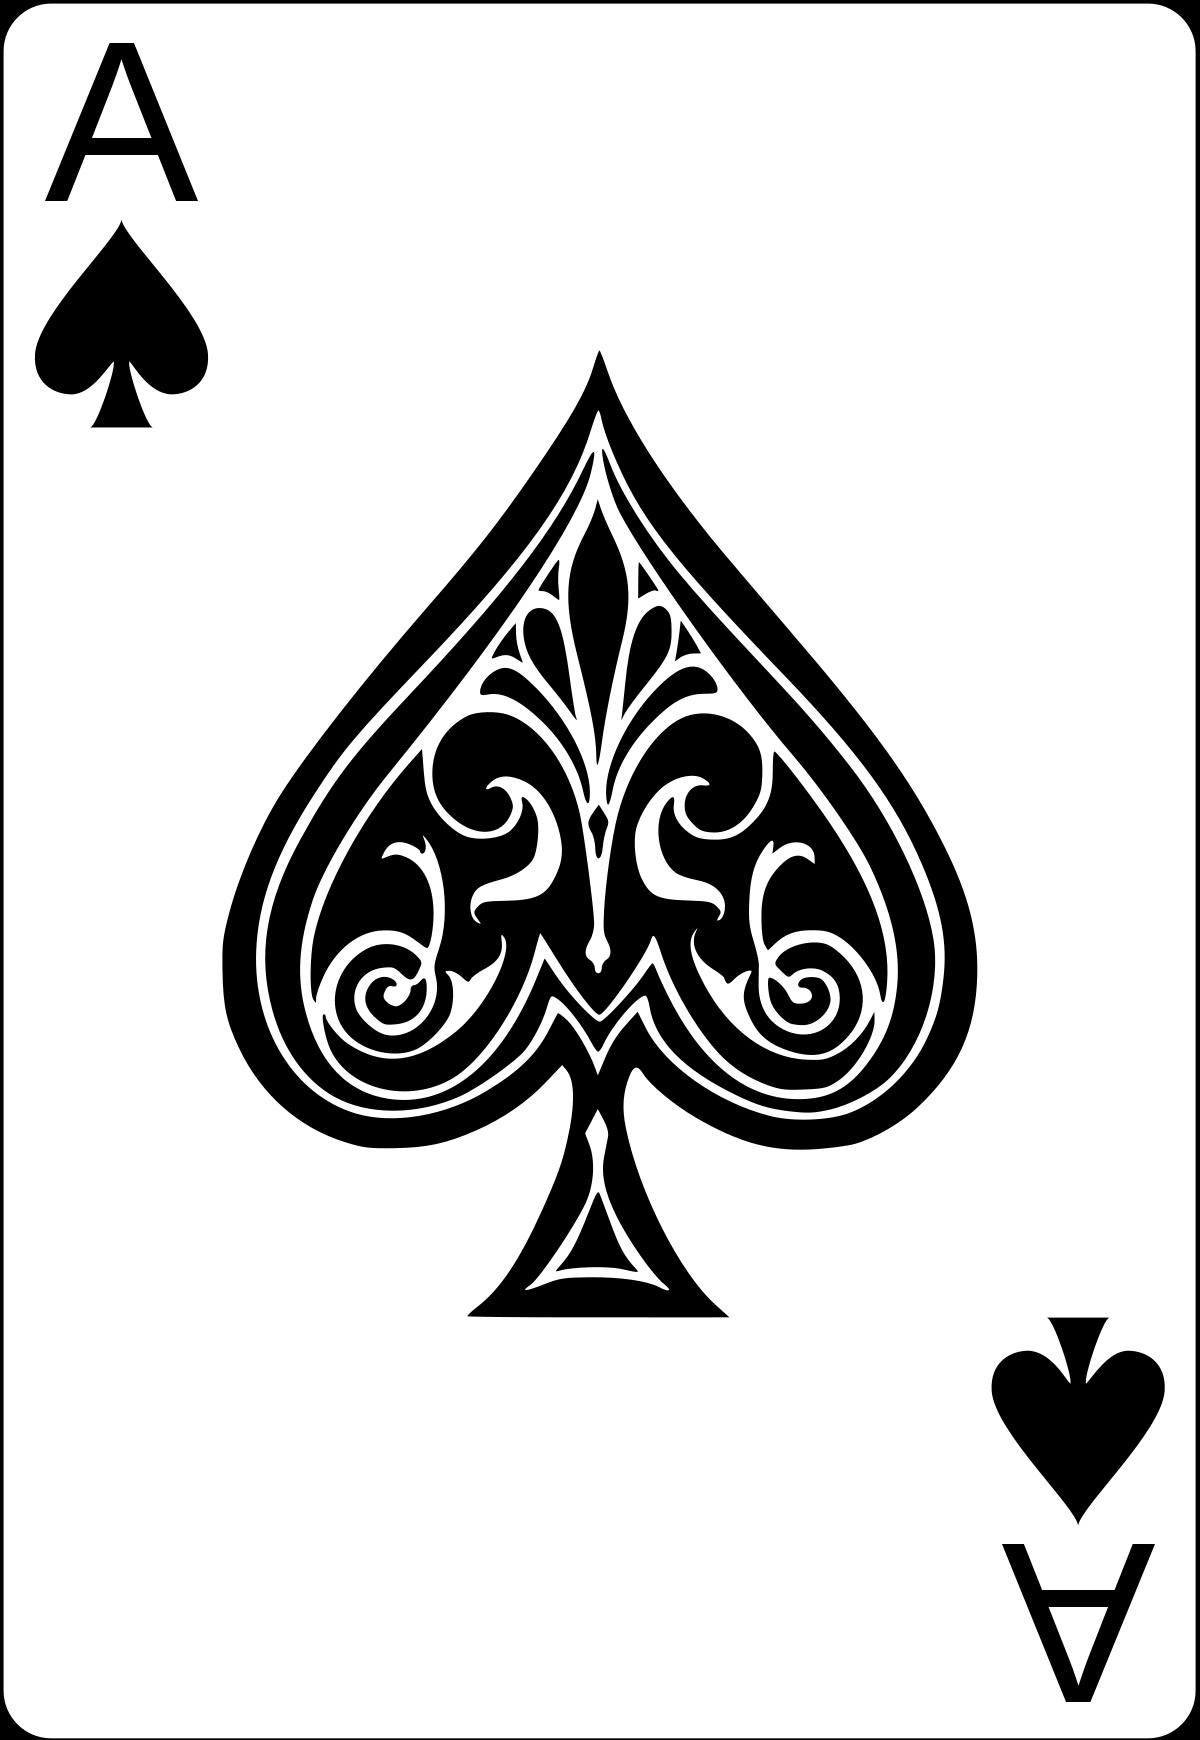 File:Ace of spades.svg.